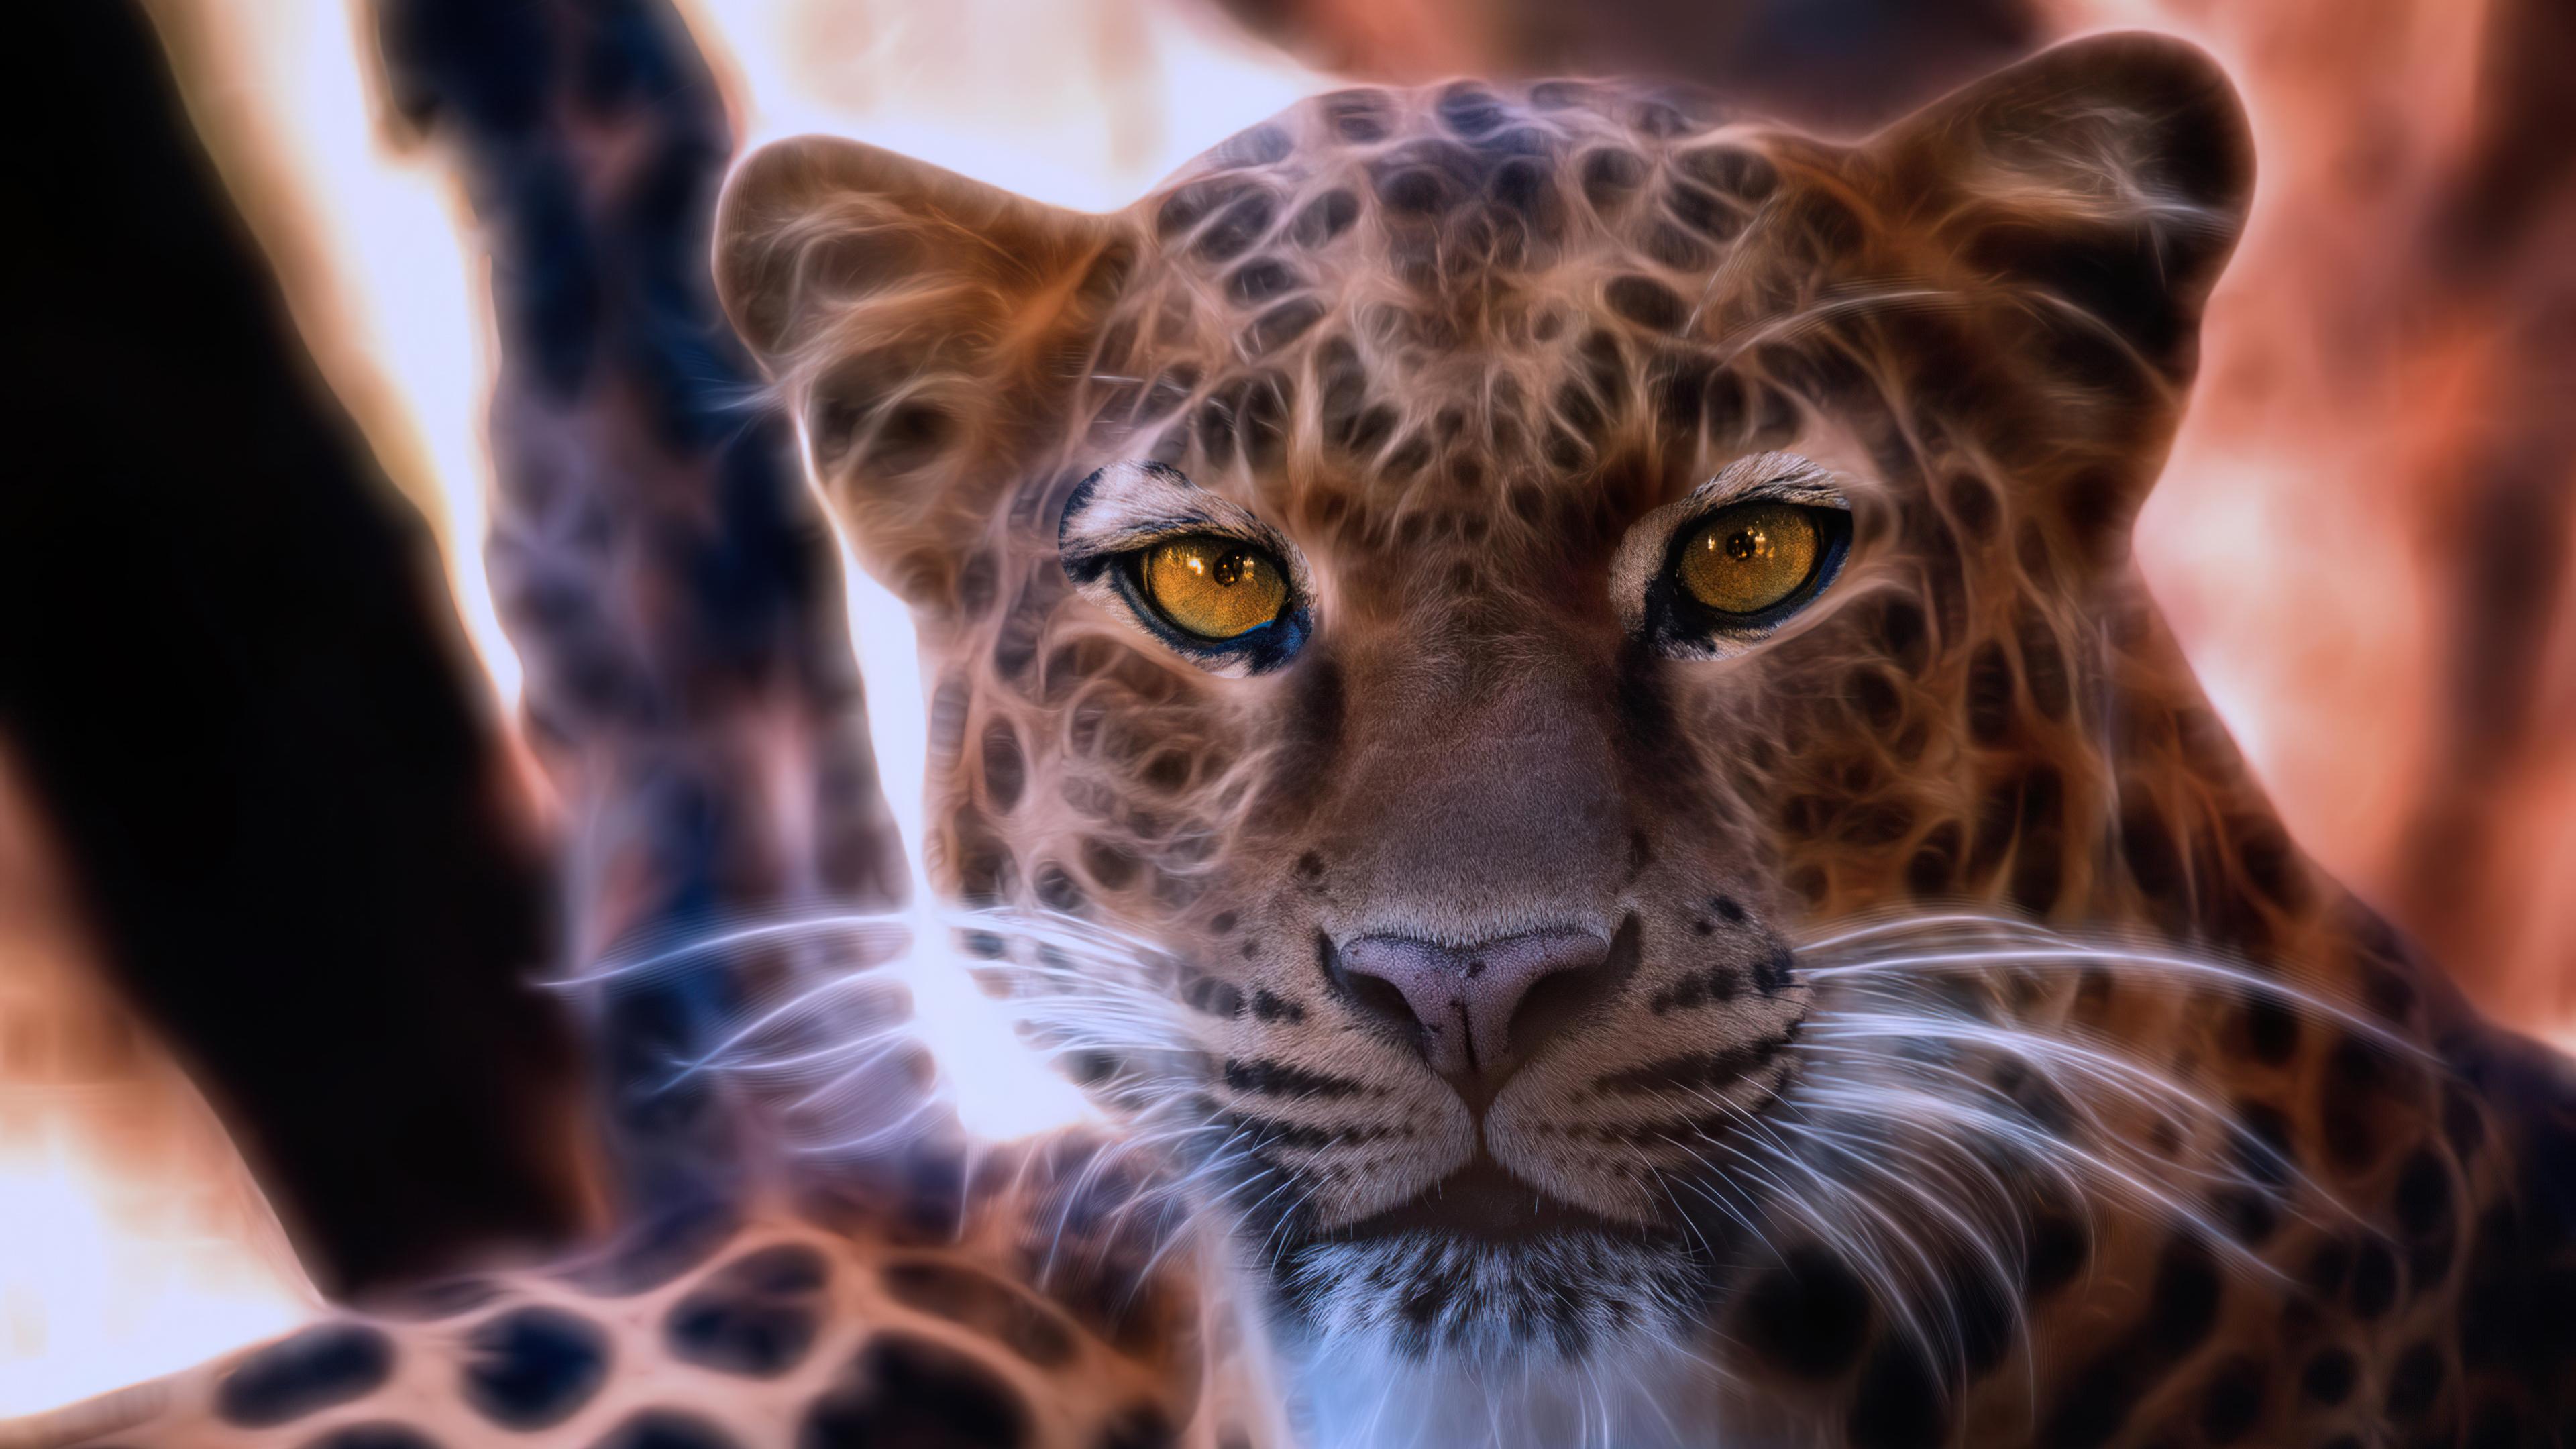 leopard crystal glowing 4k 1616872018 - Leopard Crystal Glowing 4k - Leopard Crystal Glowing 4k wallpapers